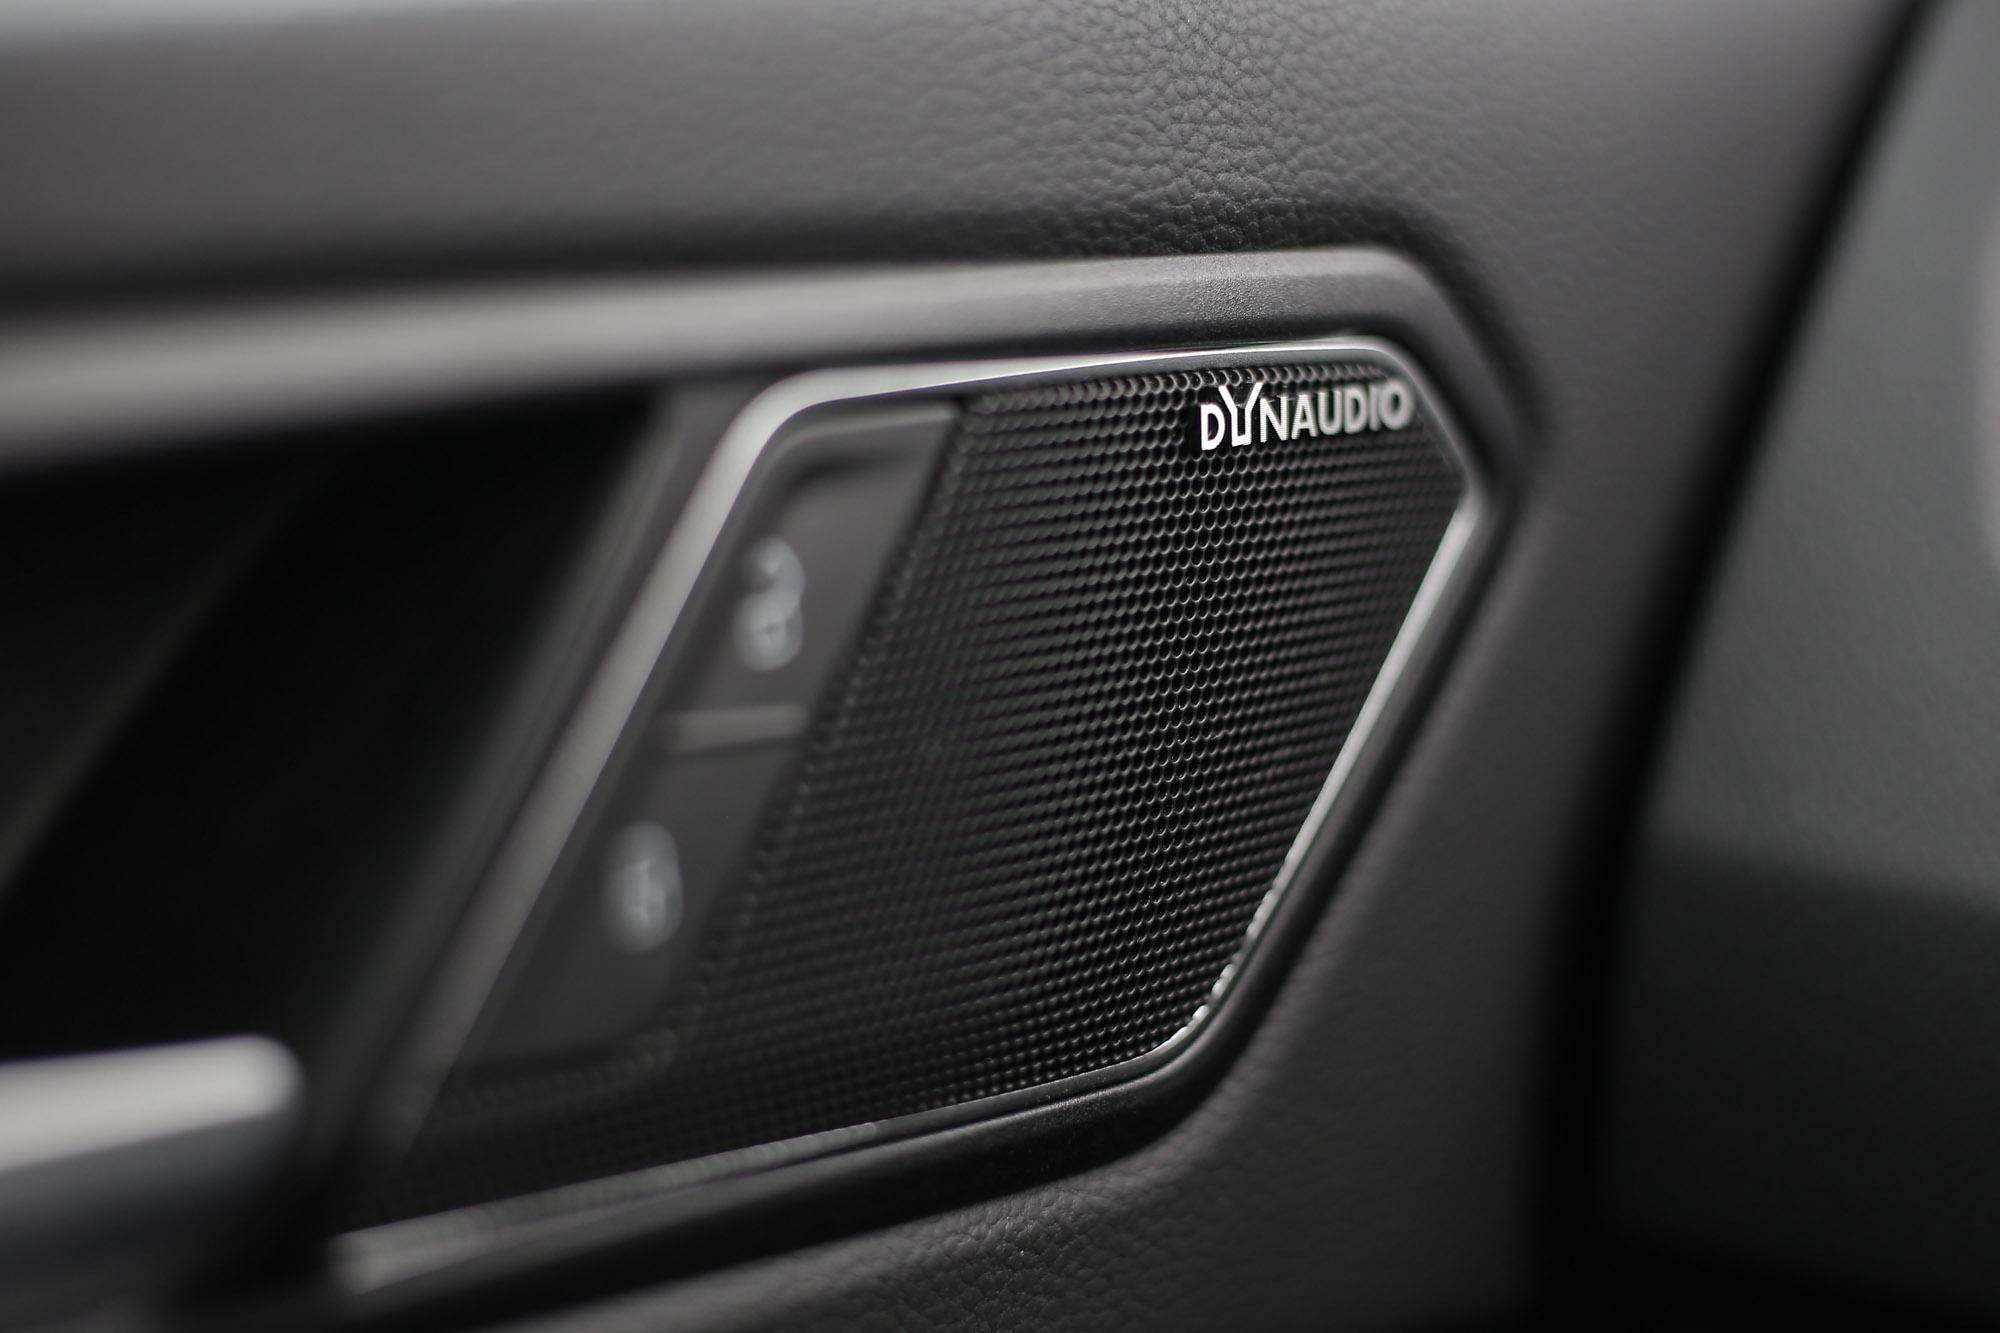 Tiguan 380 TSI標配DYNAUDIO環繞音響系統,具備9支揚聲器。